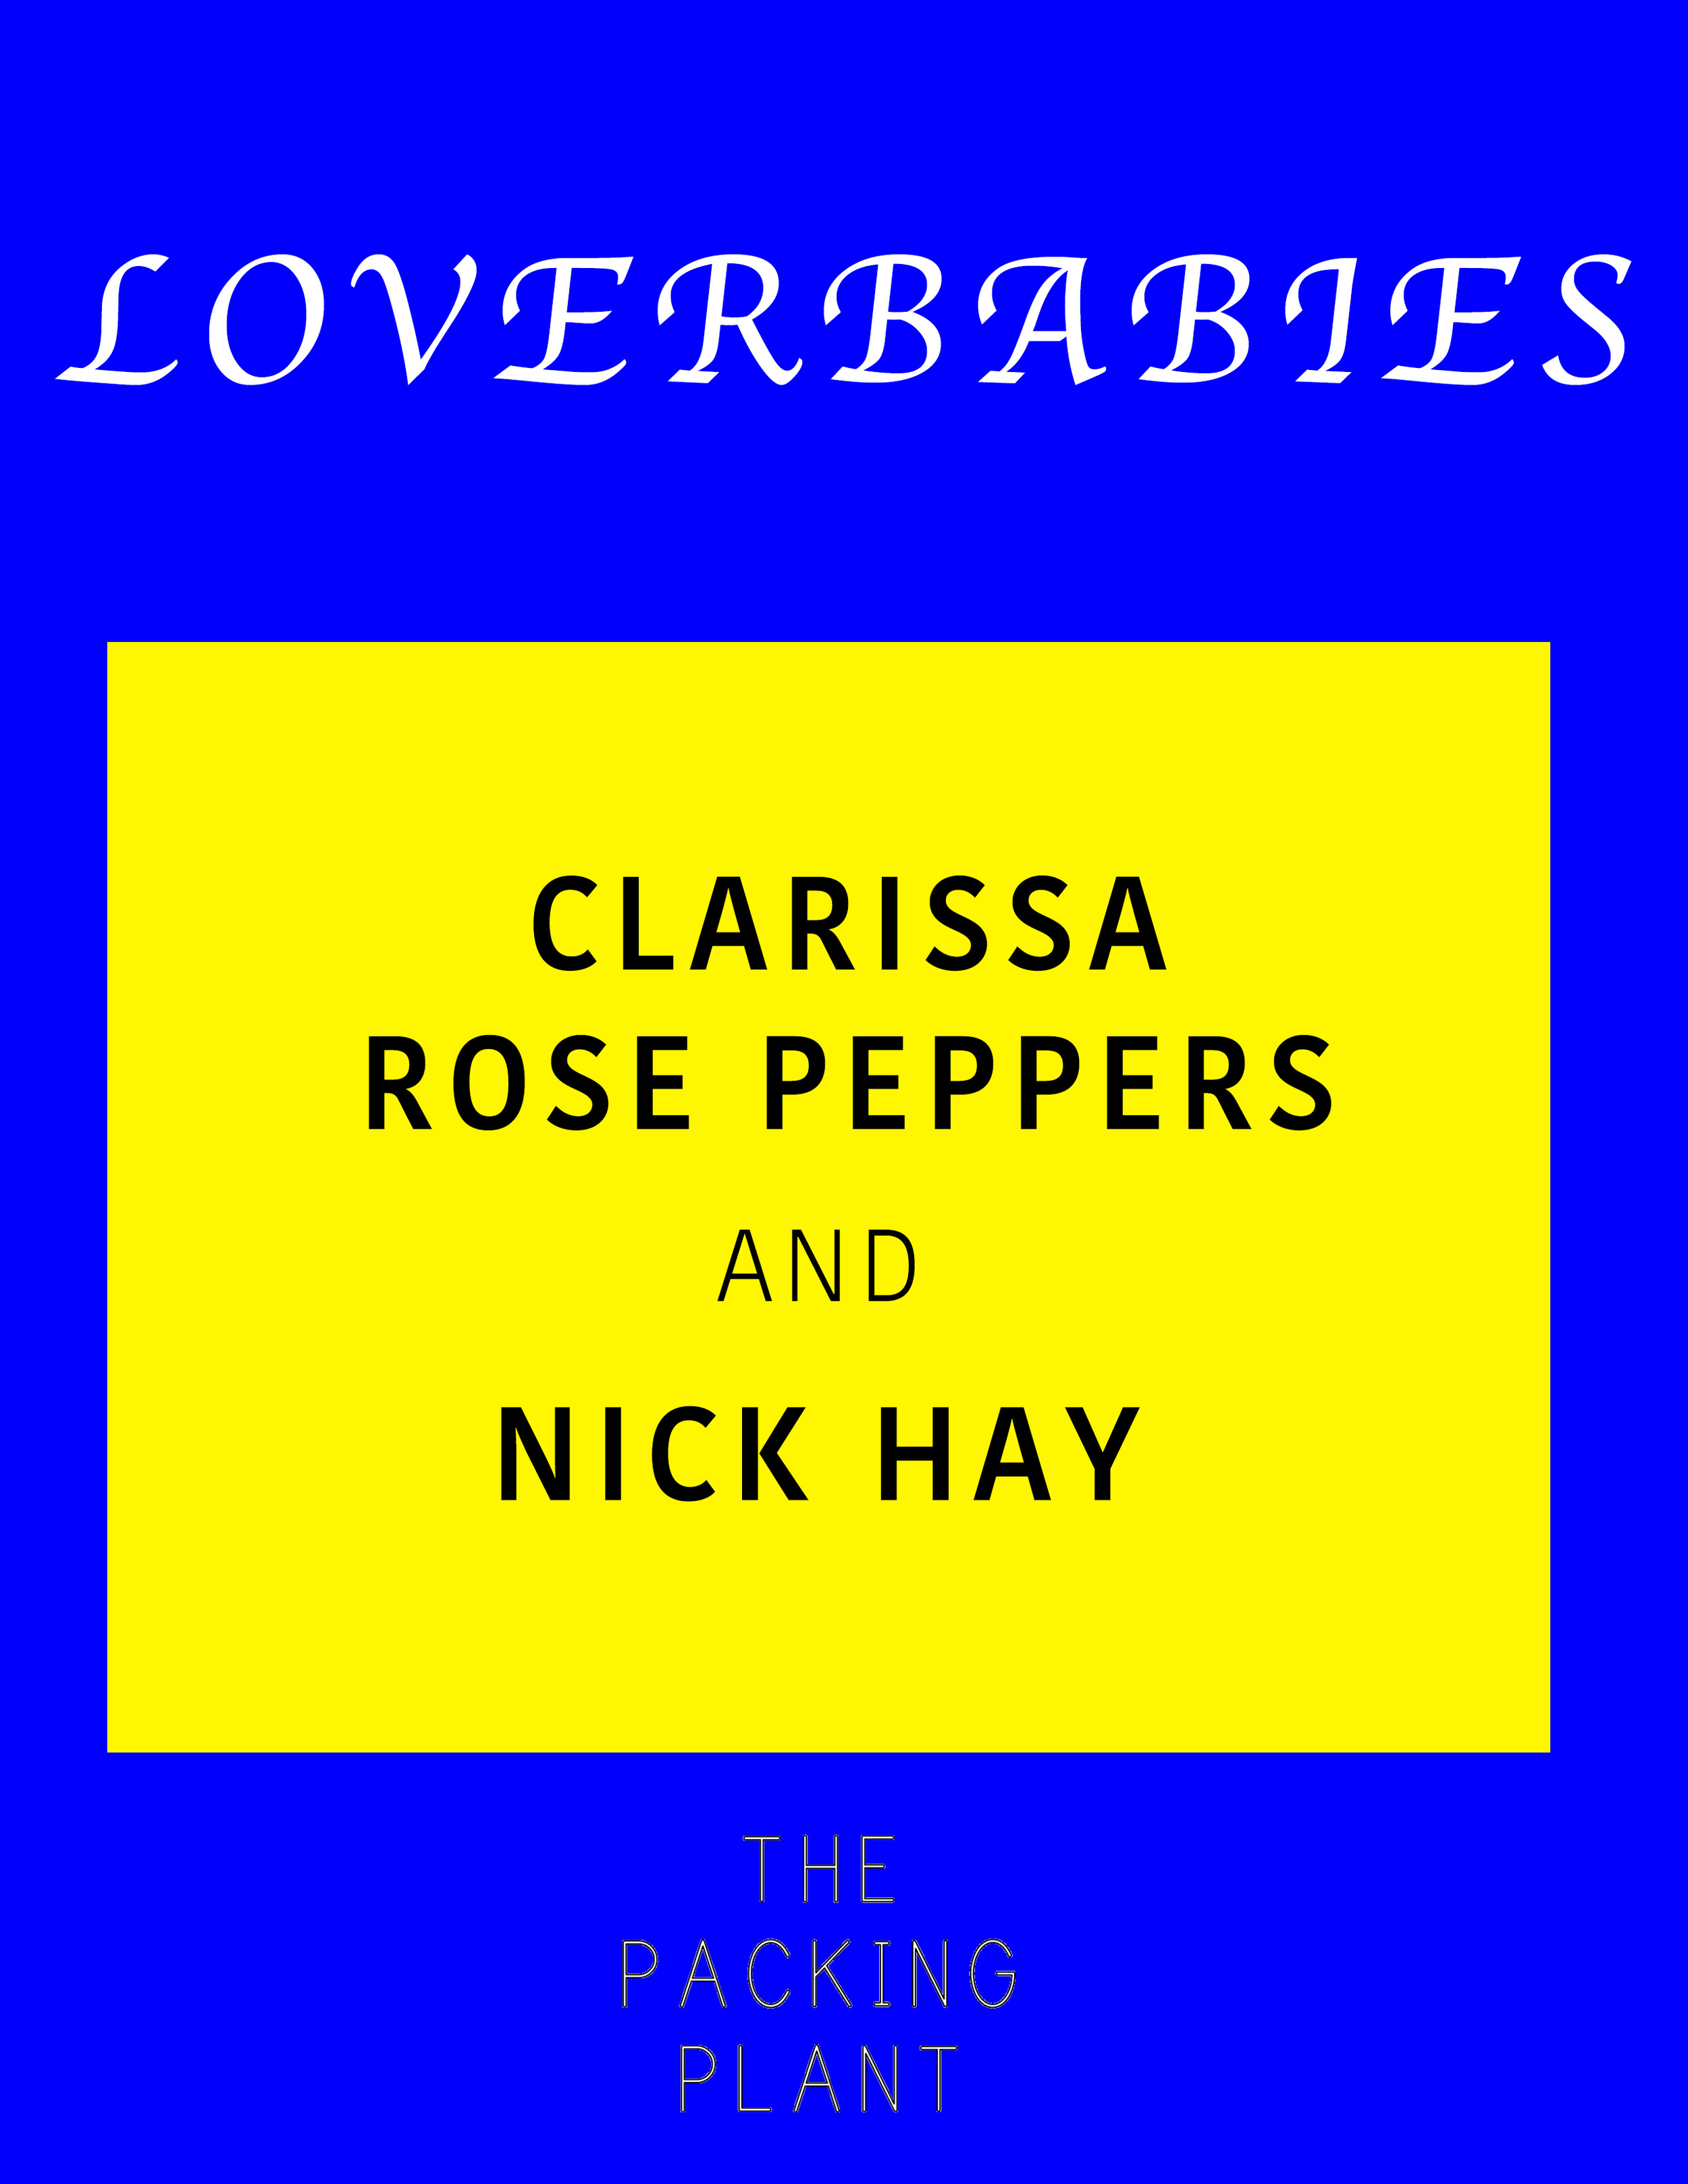 LOVERBABIES   Clarissa Rose Peppers & Nick Hay  April 2015